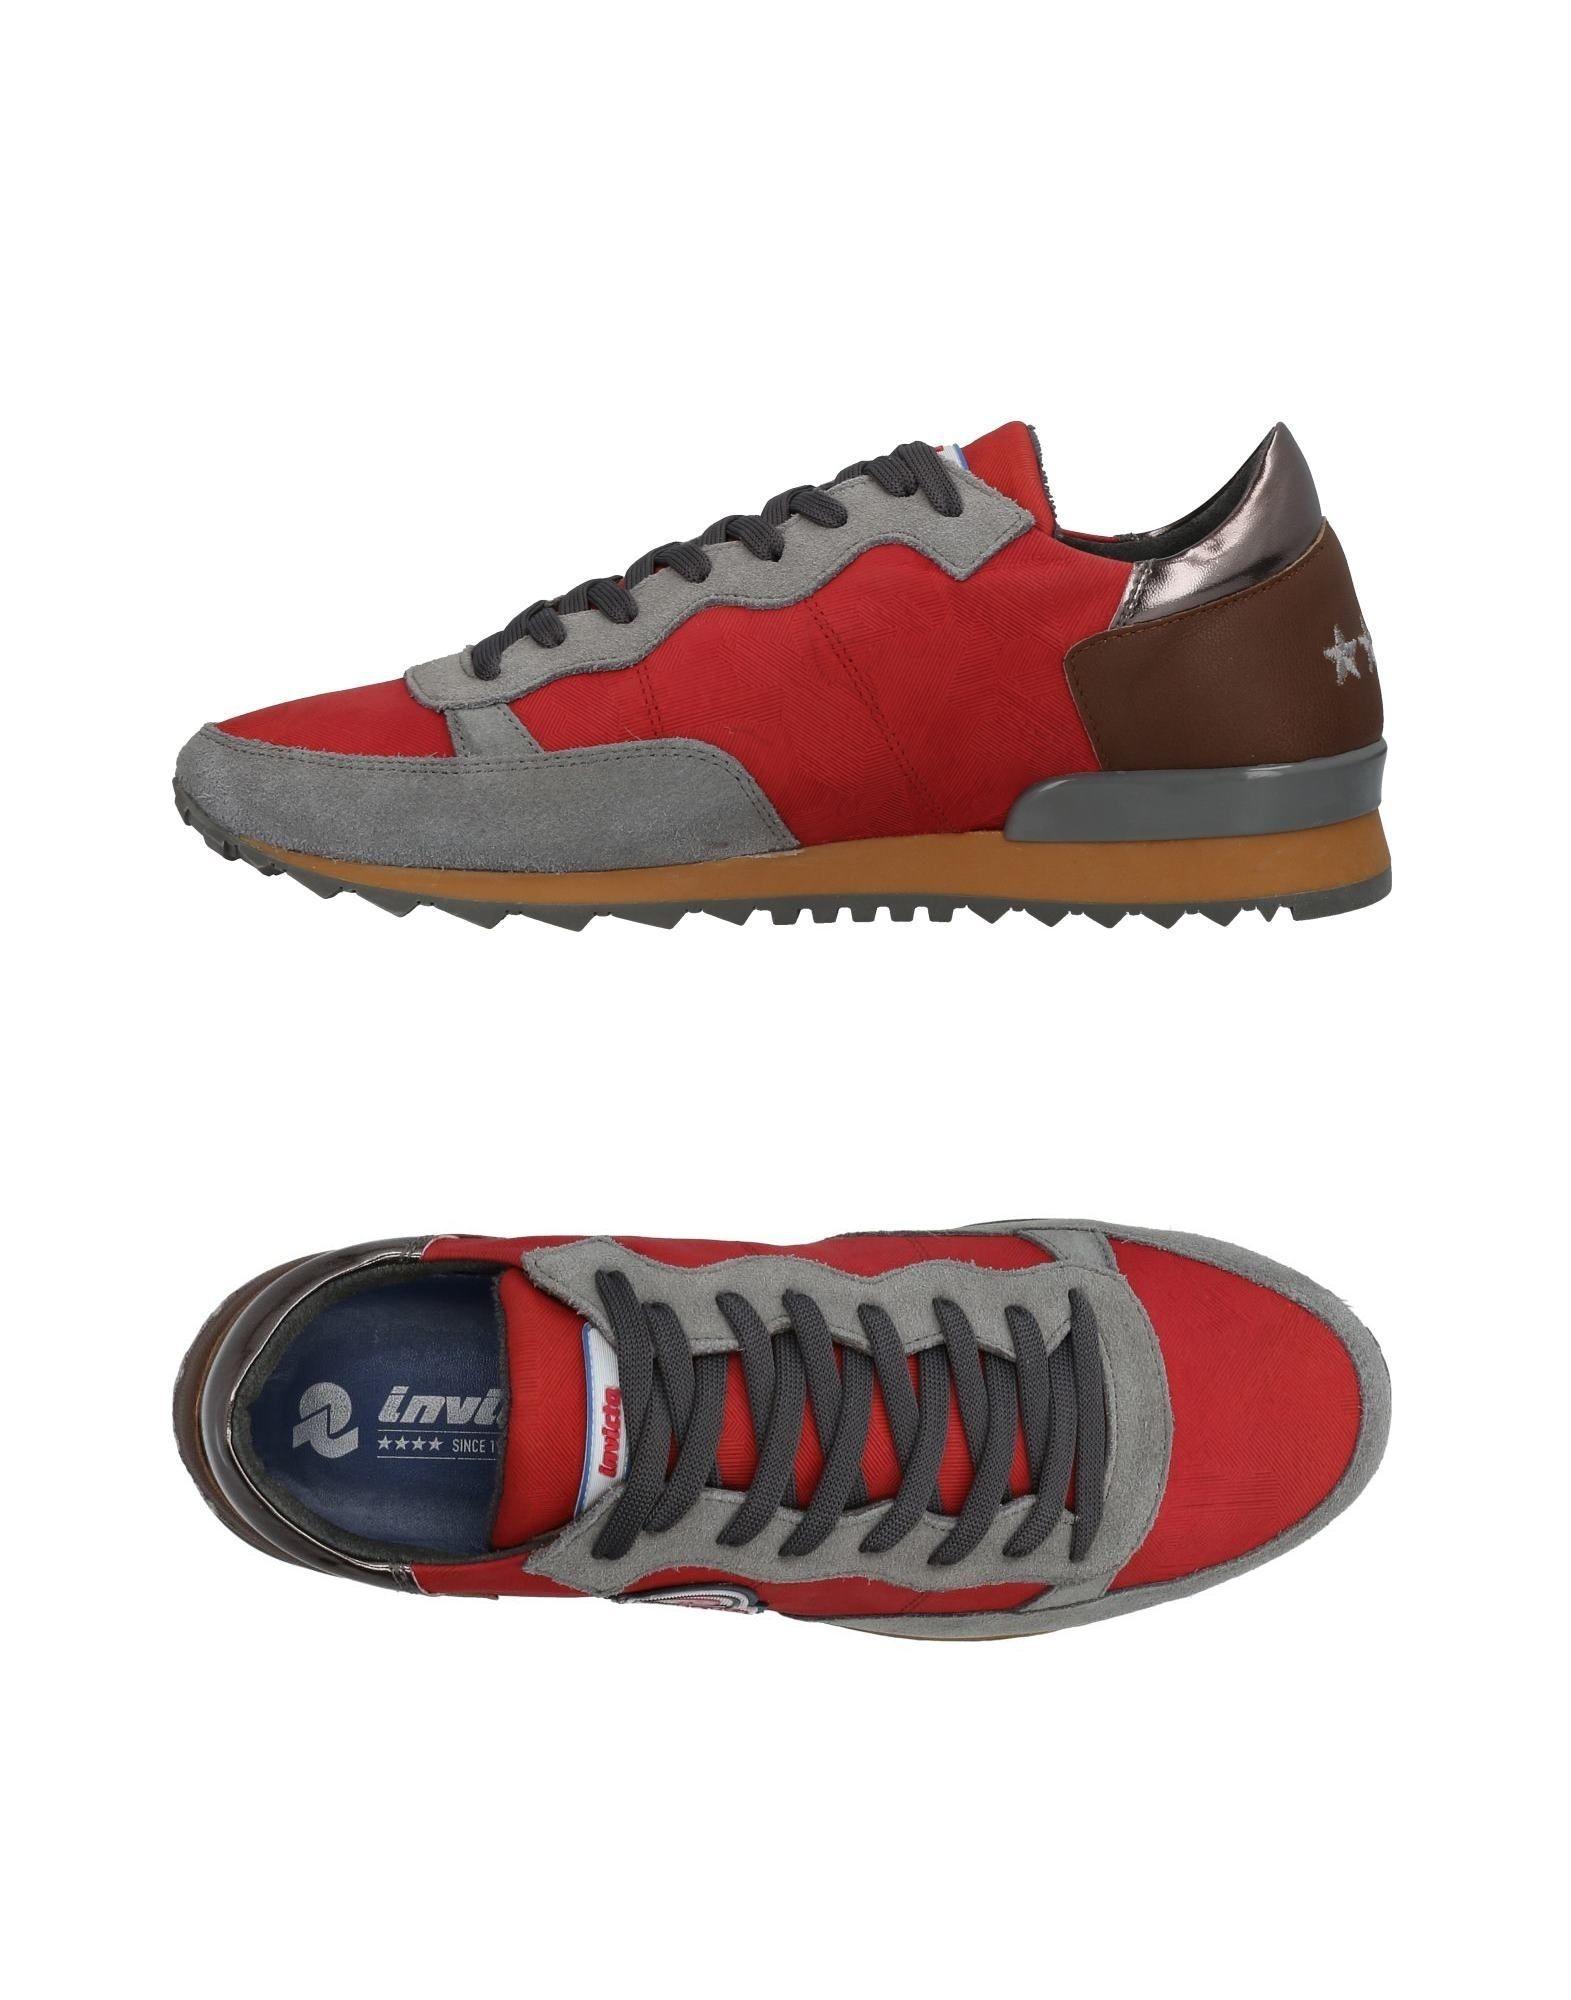 Haltbare Mode billige Schuhe Invicta Sneakers Herren  11407143VH Heiße Schuhe